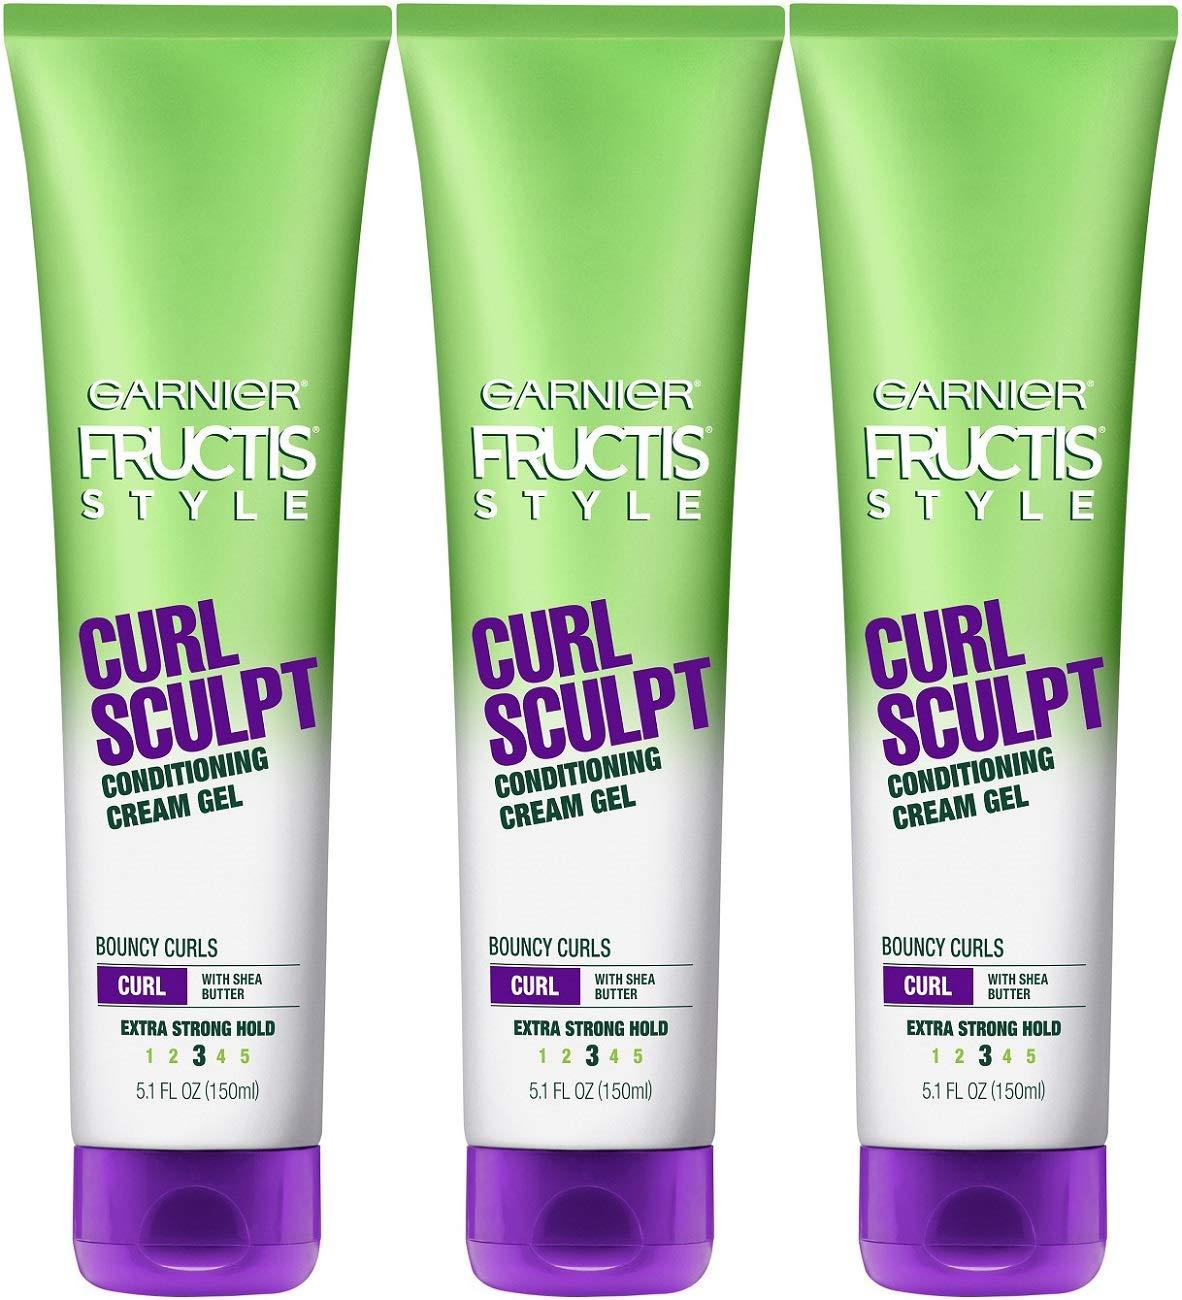 Garnier Fructis Style Curl Sculpt Conditioning Cream Gel, Mint, 5.1 Fl Oz (Pack of 3)